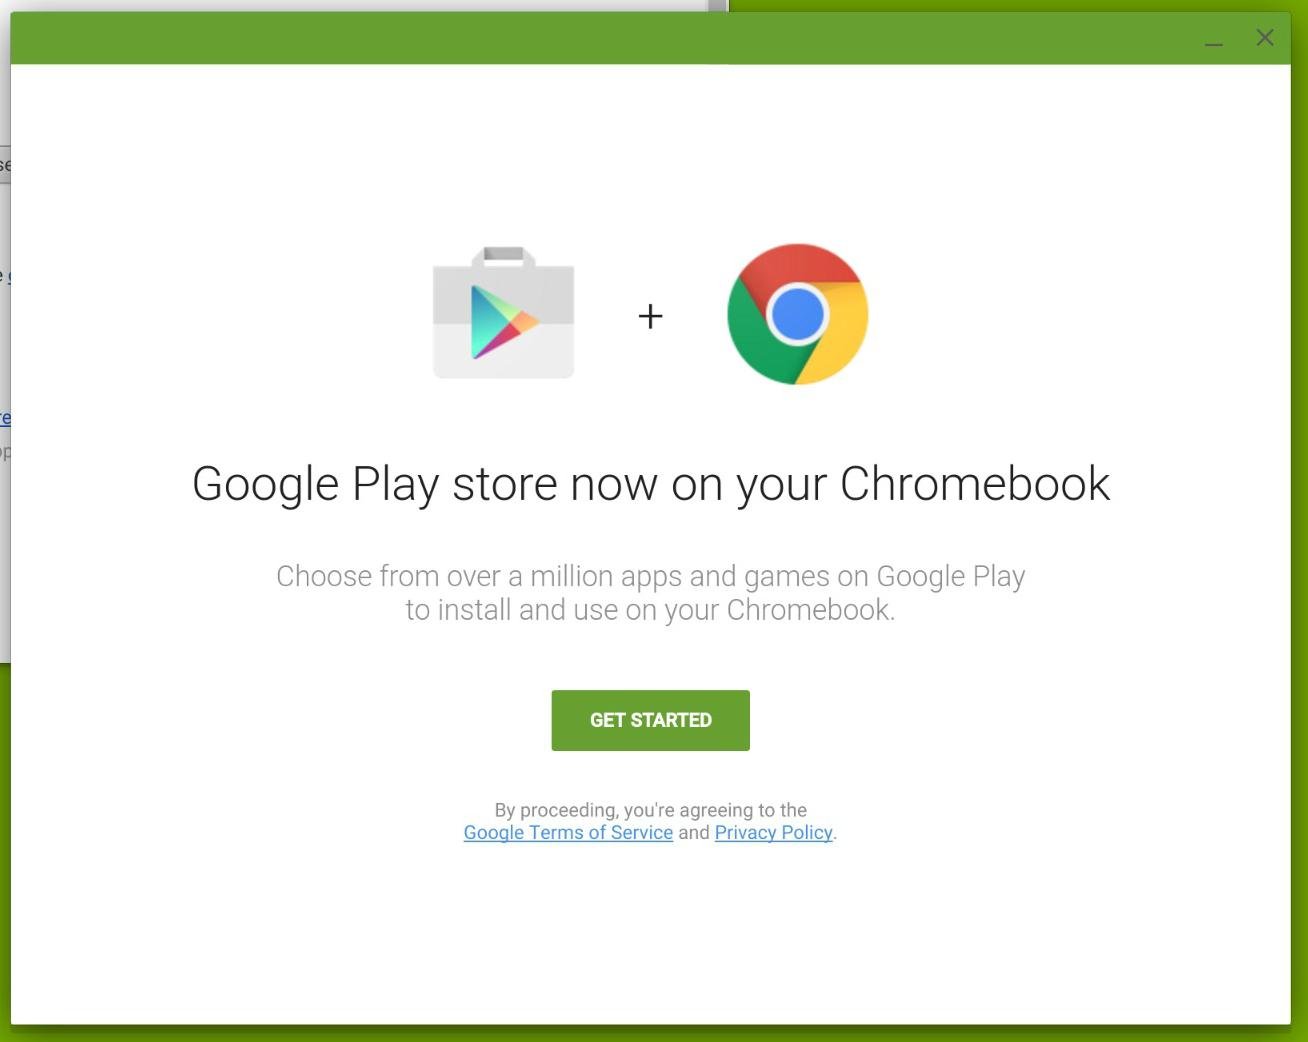 Google Play Store On Chromebook